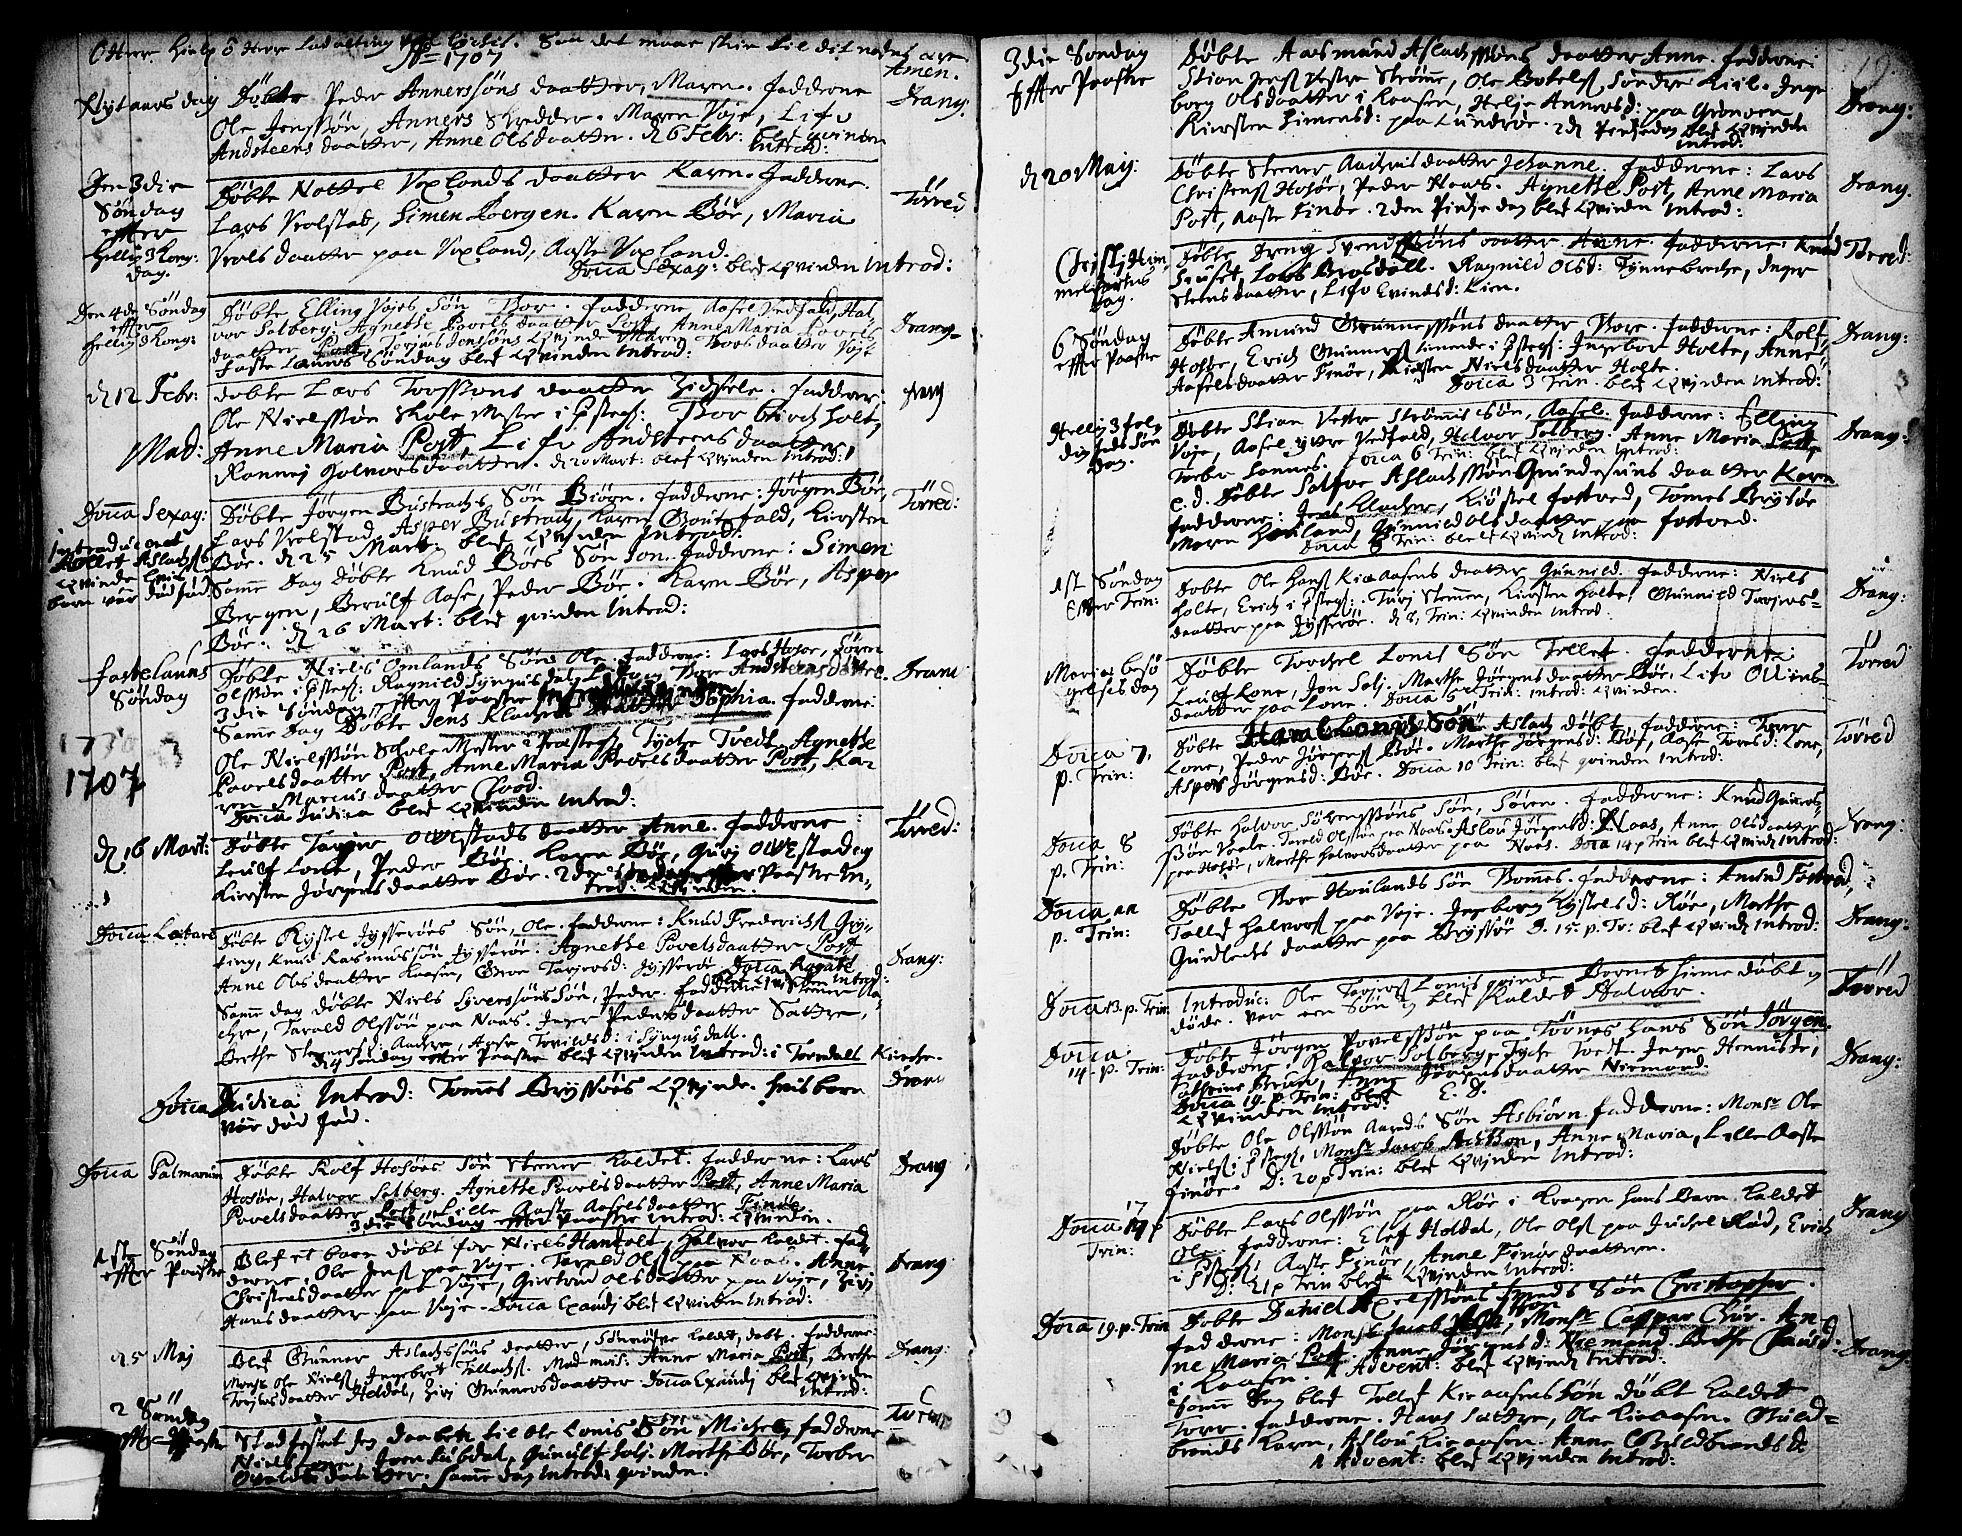 SAKO, Drangedal kirkebøker, F/Fa/L0001: Ministerialbok nr. 1, 1697-1767, s. 19